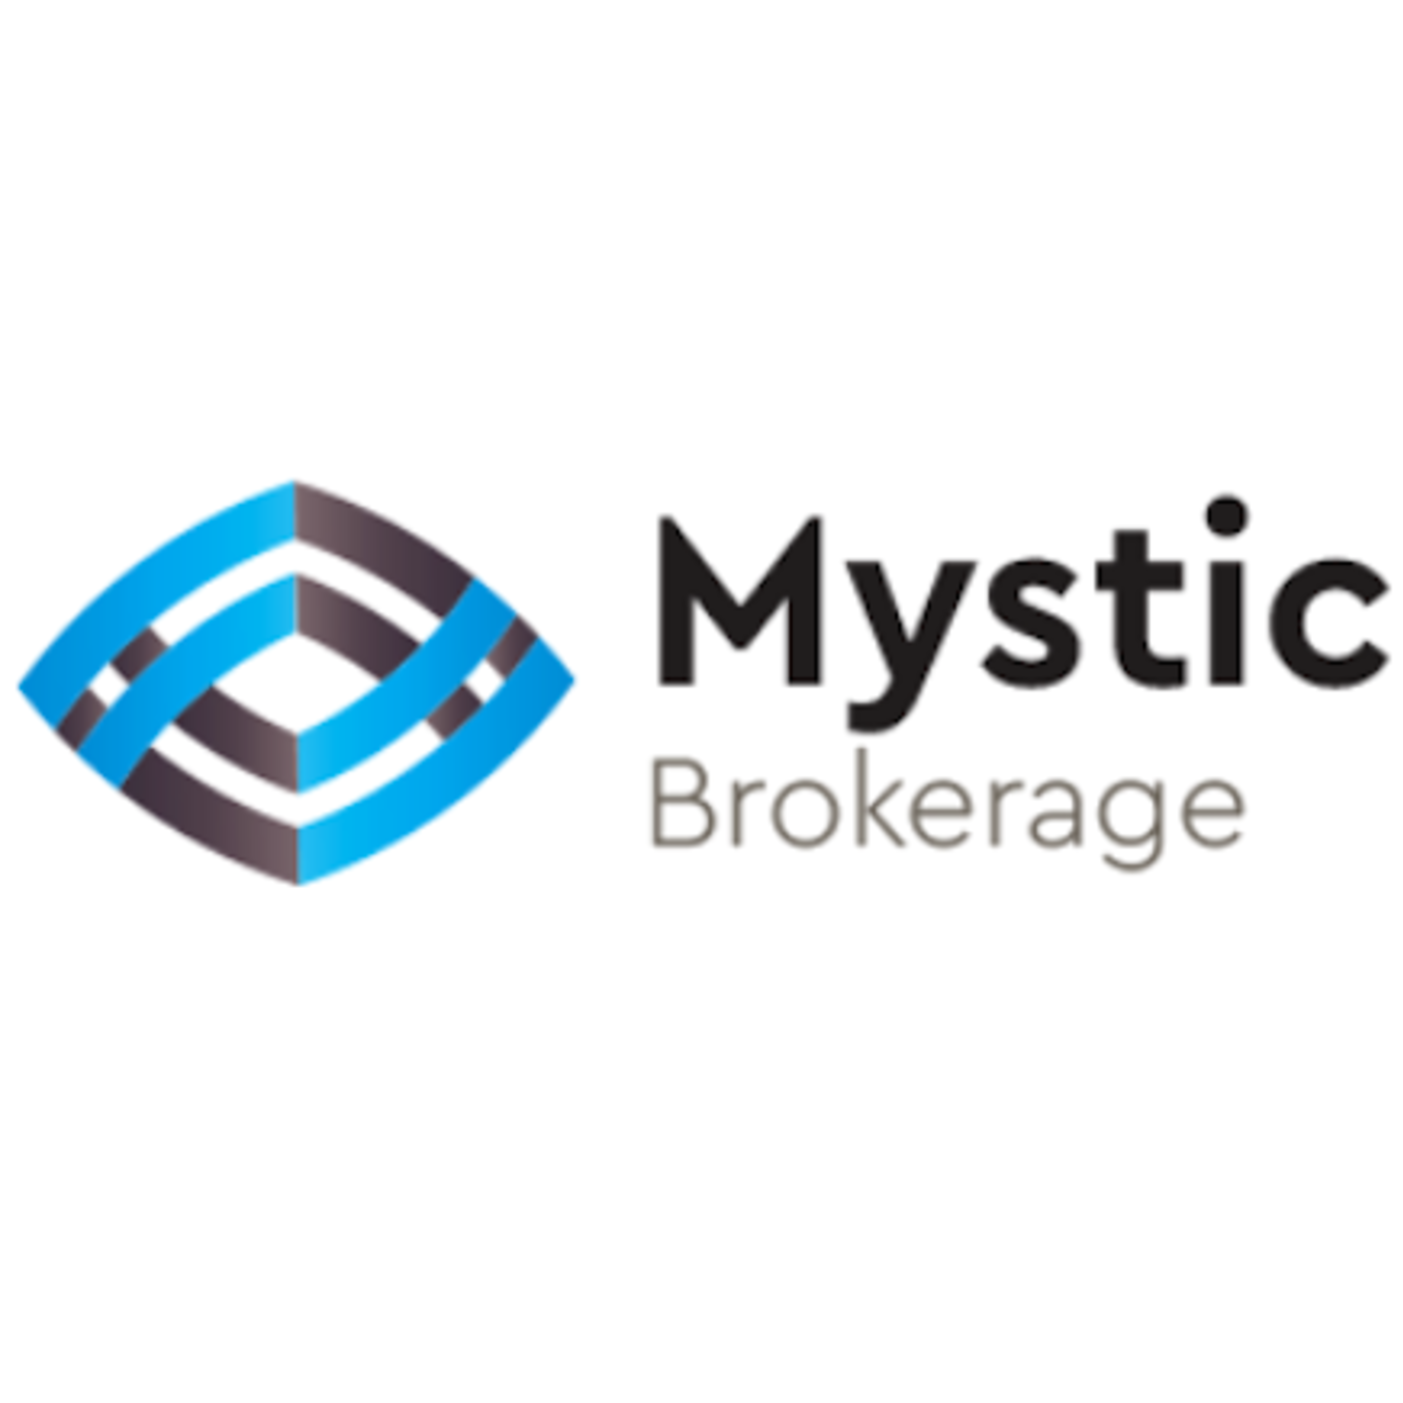 Mystic Brokerage Inc. image 0